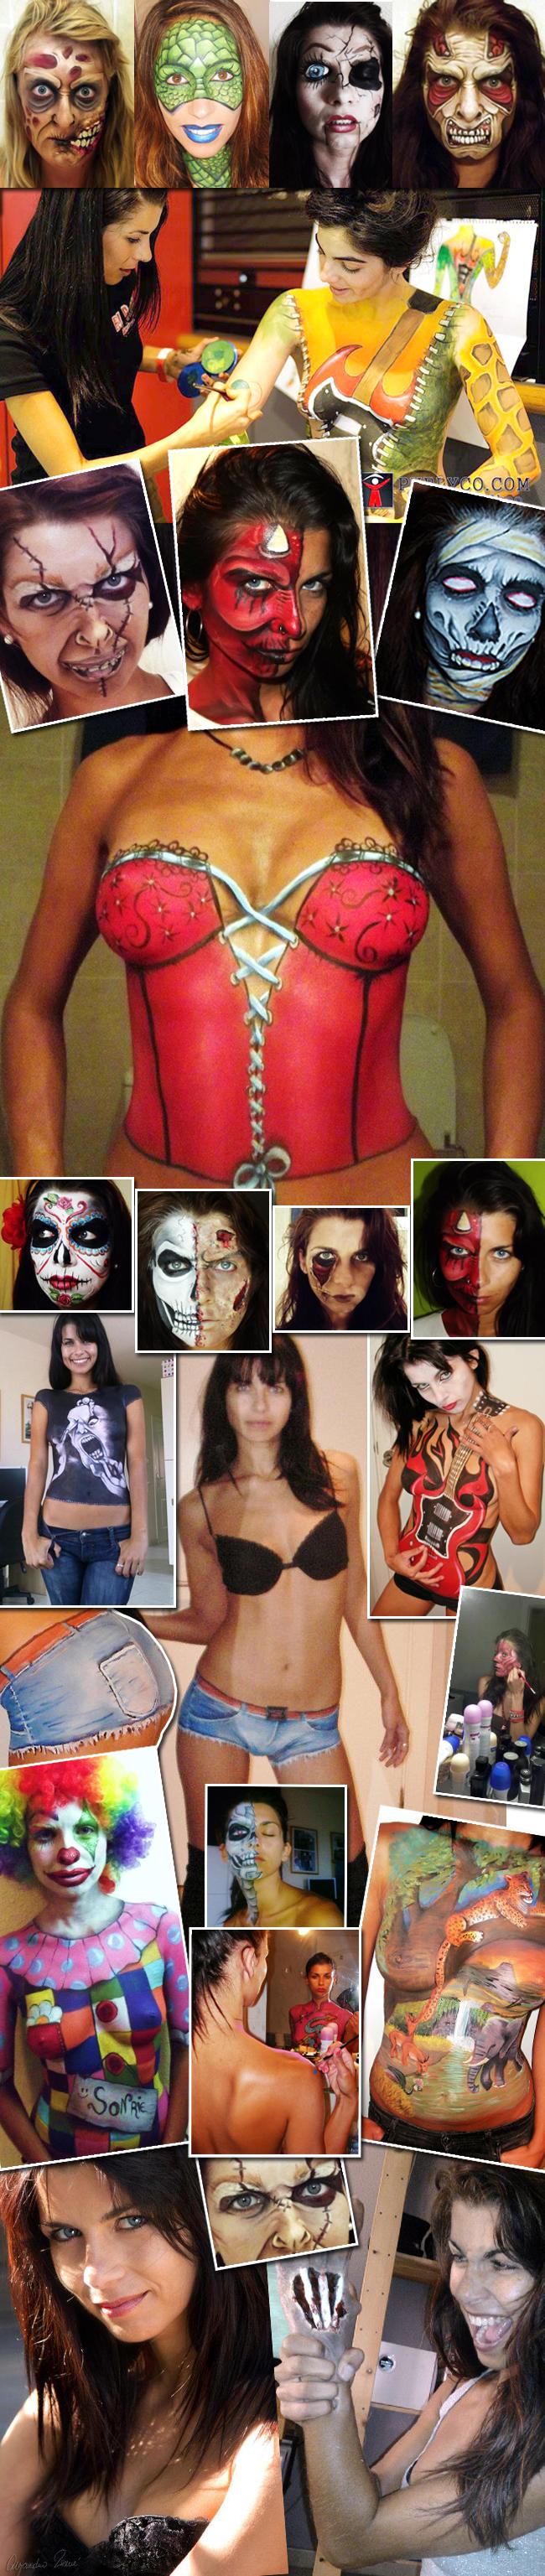 Yasmina-Jacinto-body-painting-pintura-maquillaje-corporal-FX-aerografia-aerografo